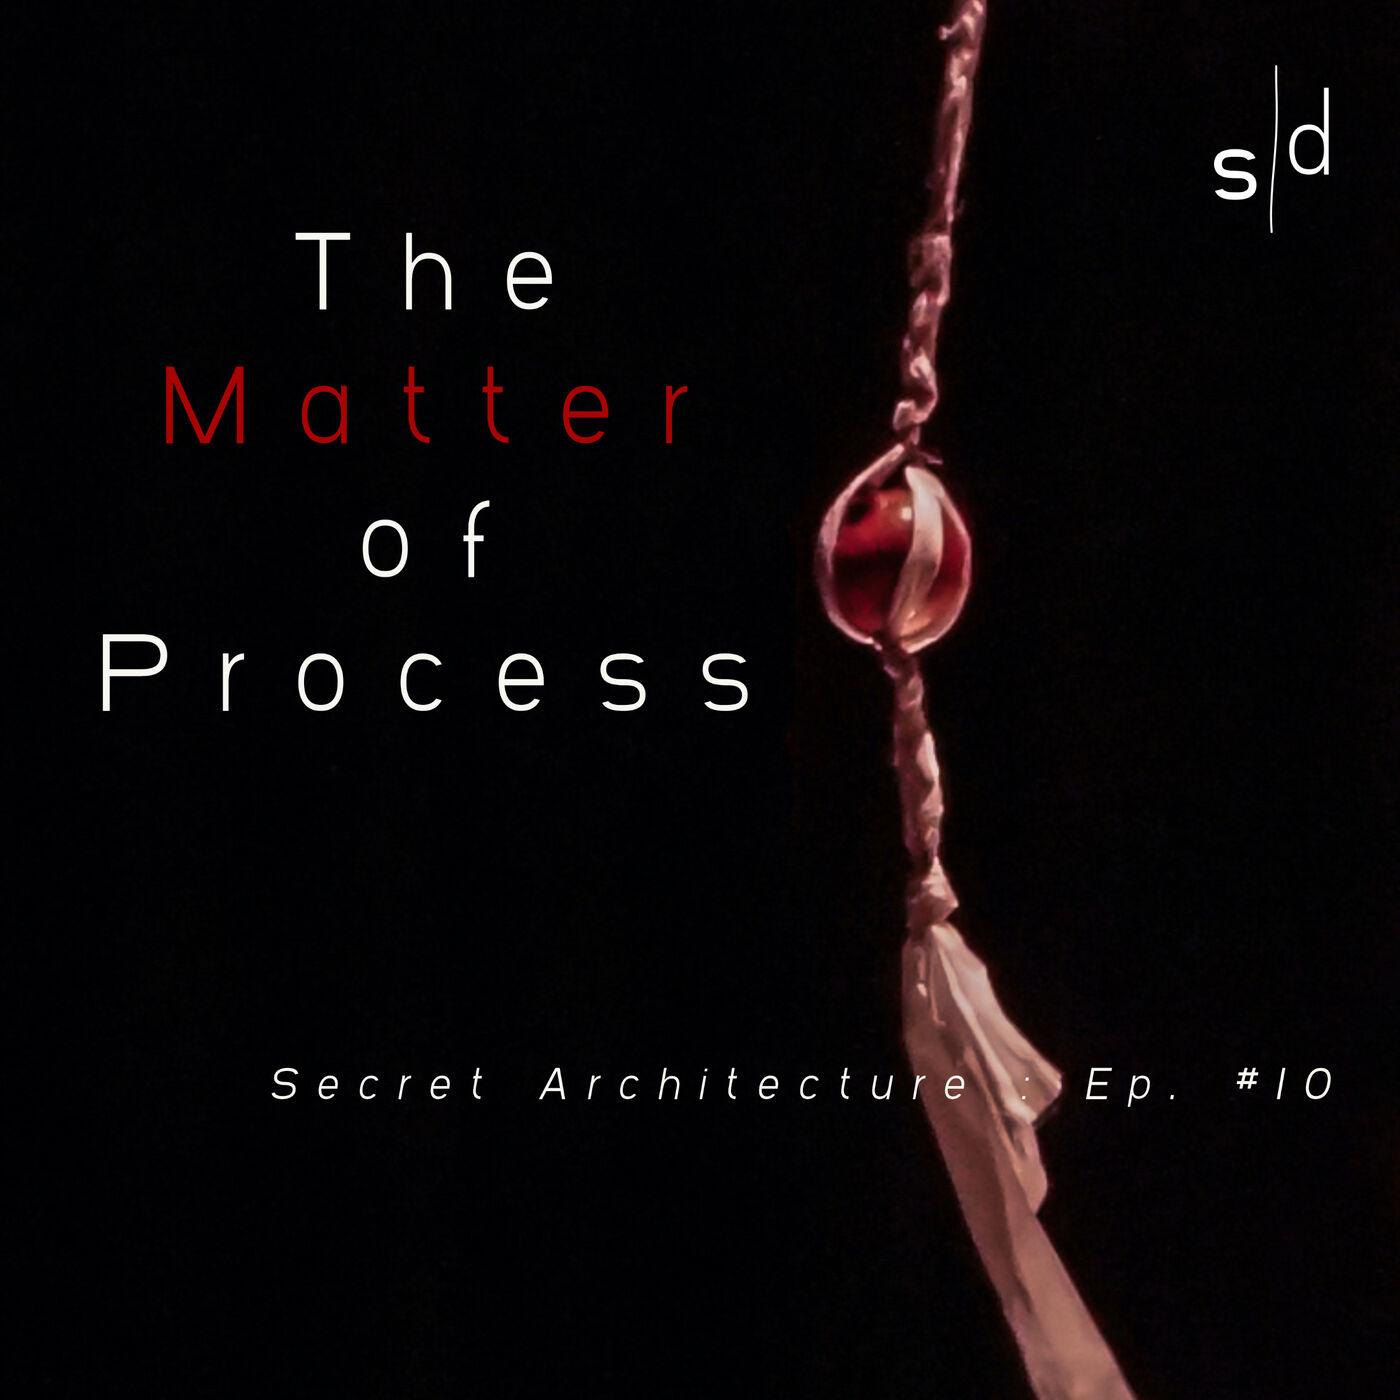 The Matter of Process